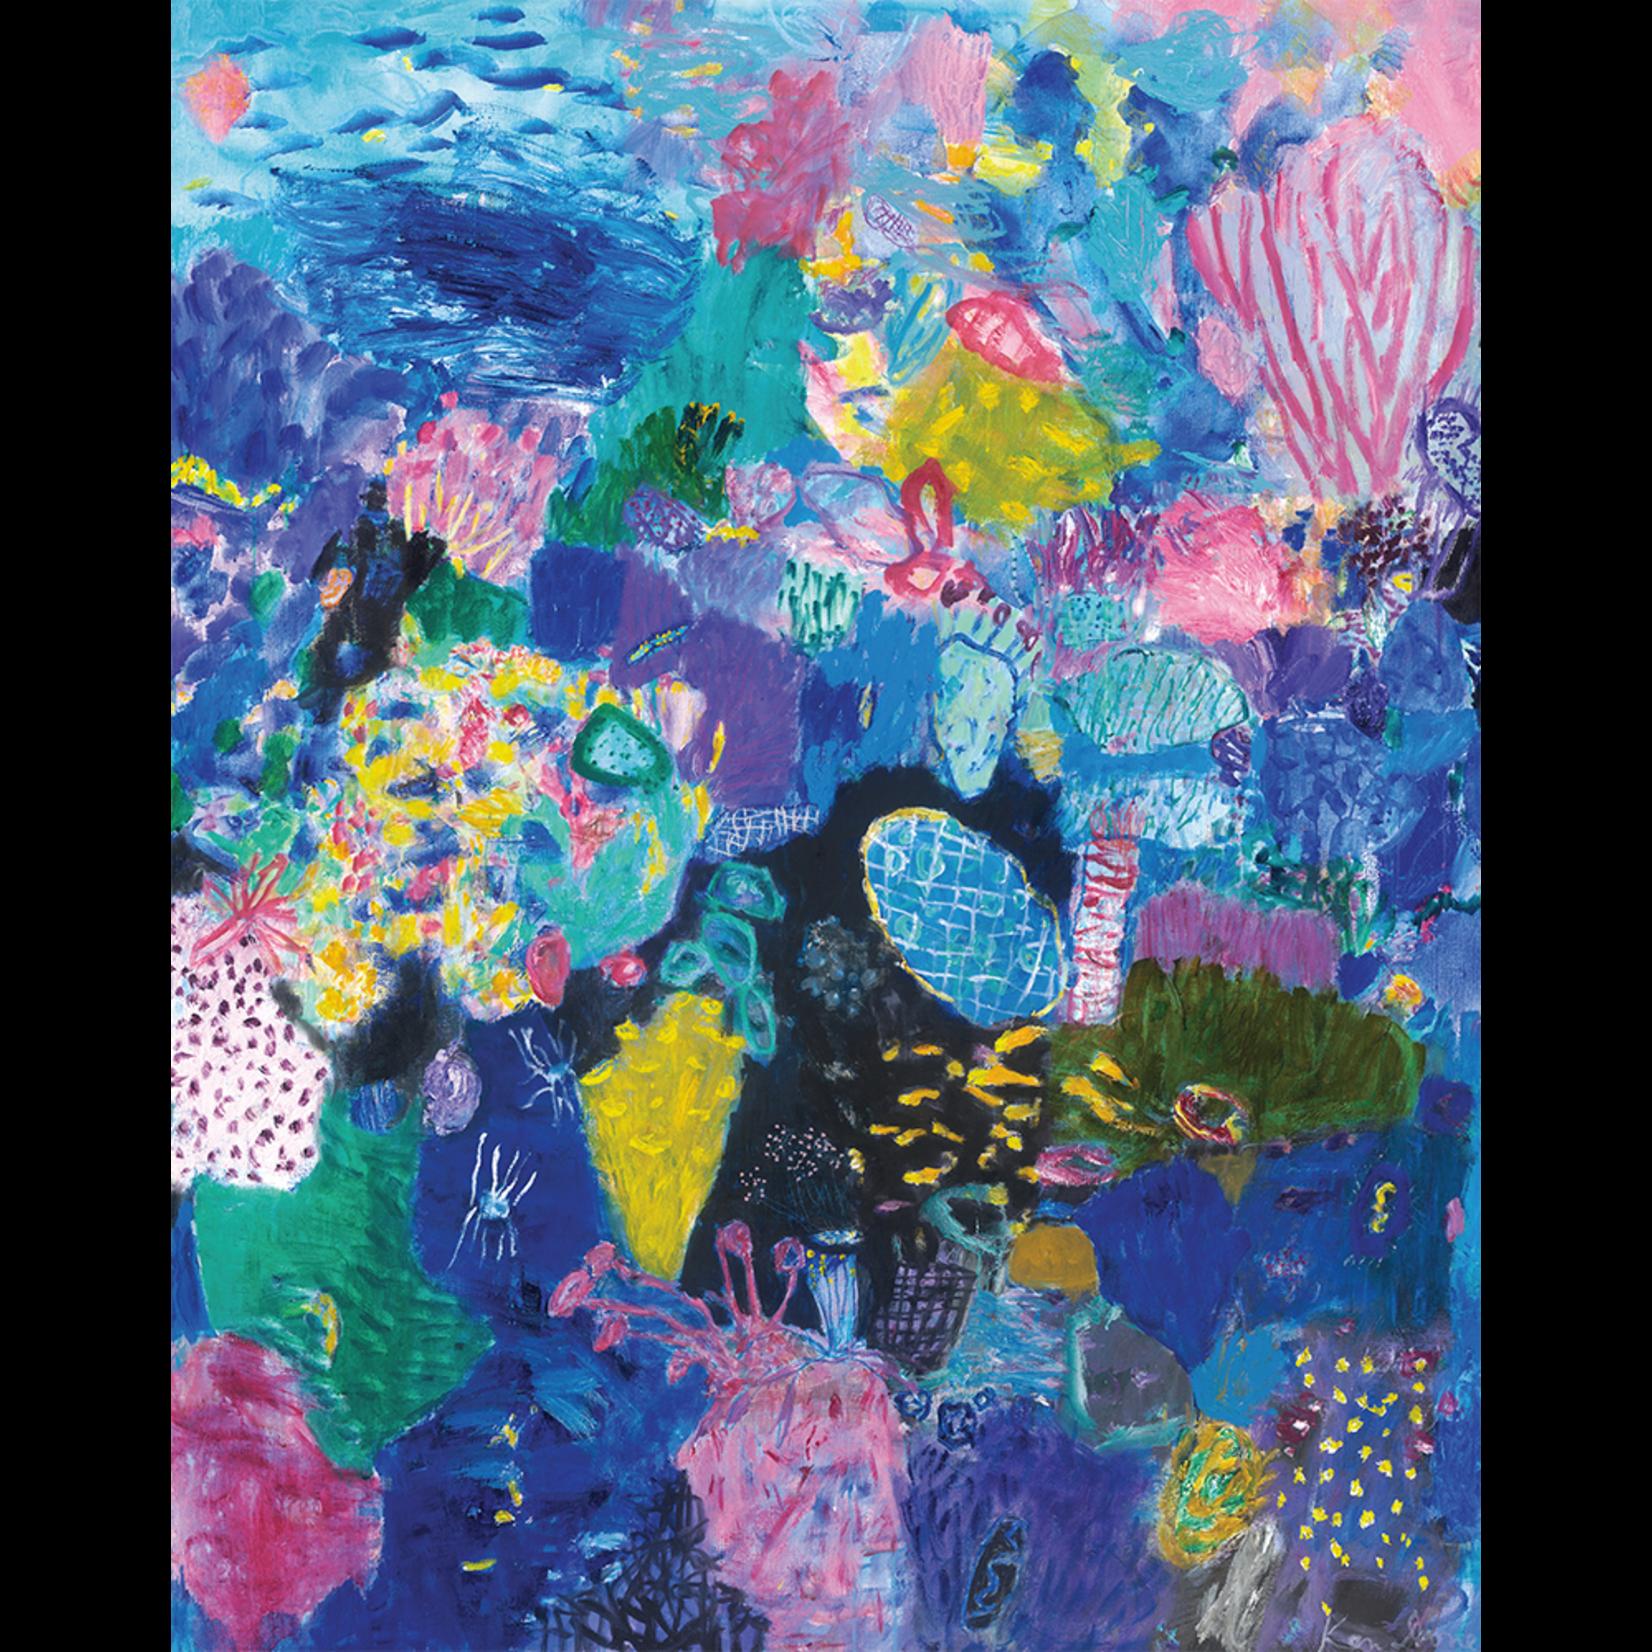 Books & Stationery Jigsaw puzzle - Ultramarine Reef